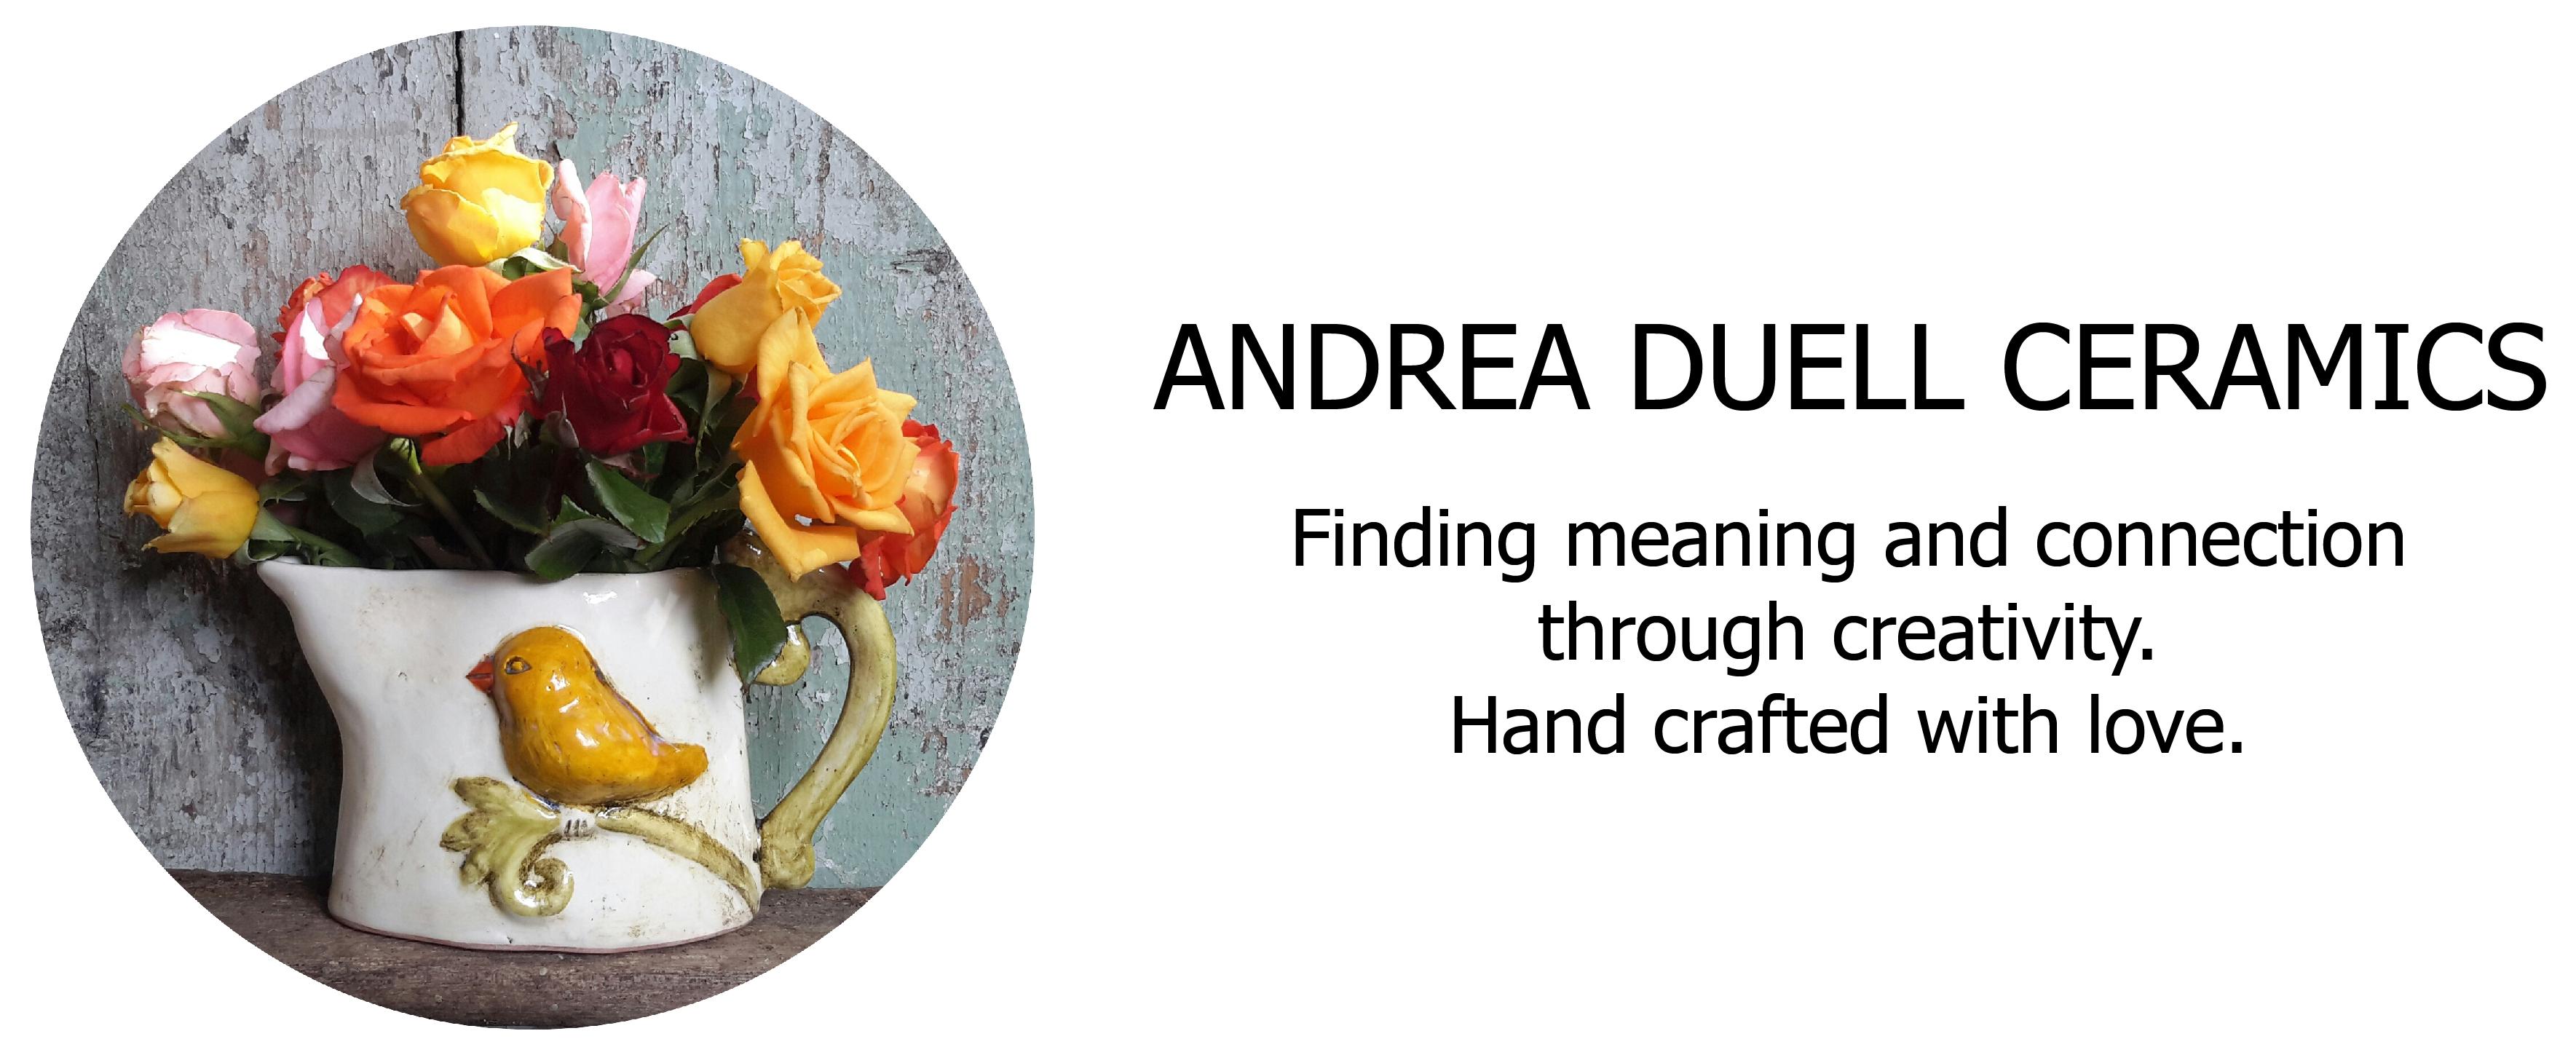 Andreaduellceramics